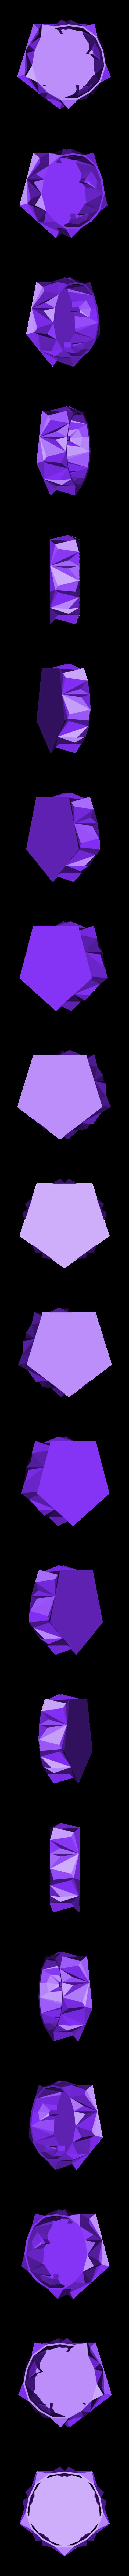 006_JEWELERYBOx_Body.stl Download STL file CUBISM JEWELLERY BOX • Object to 3D print, cisardom